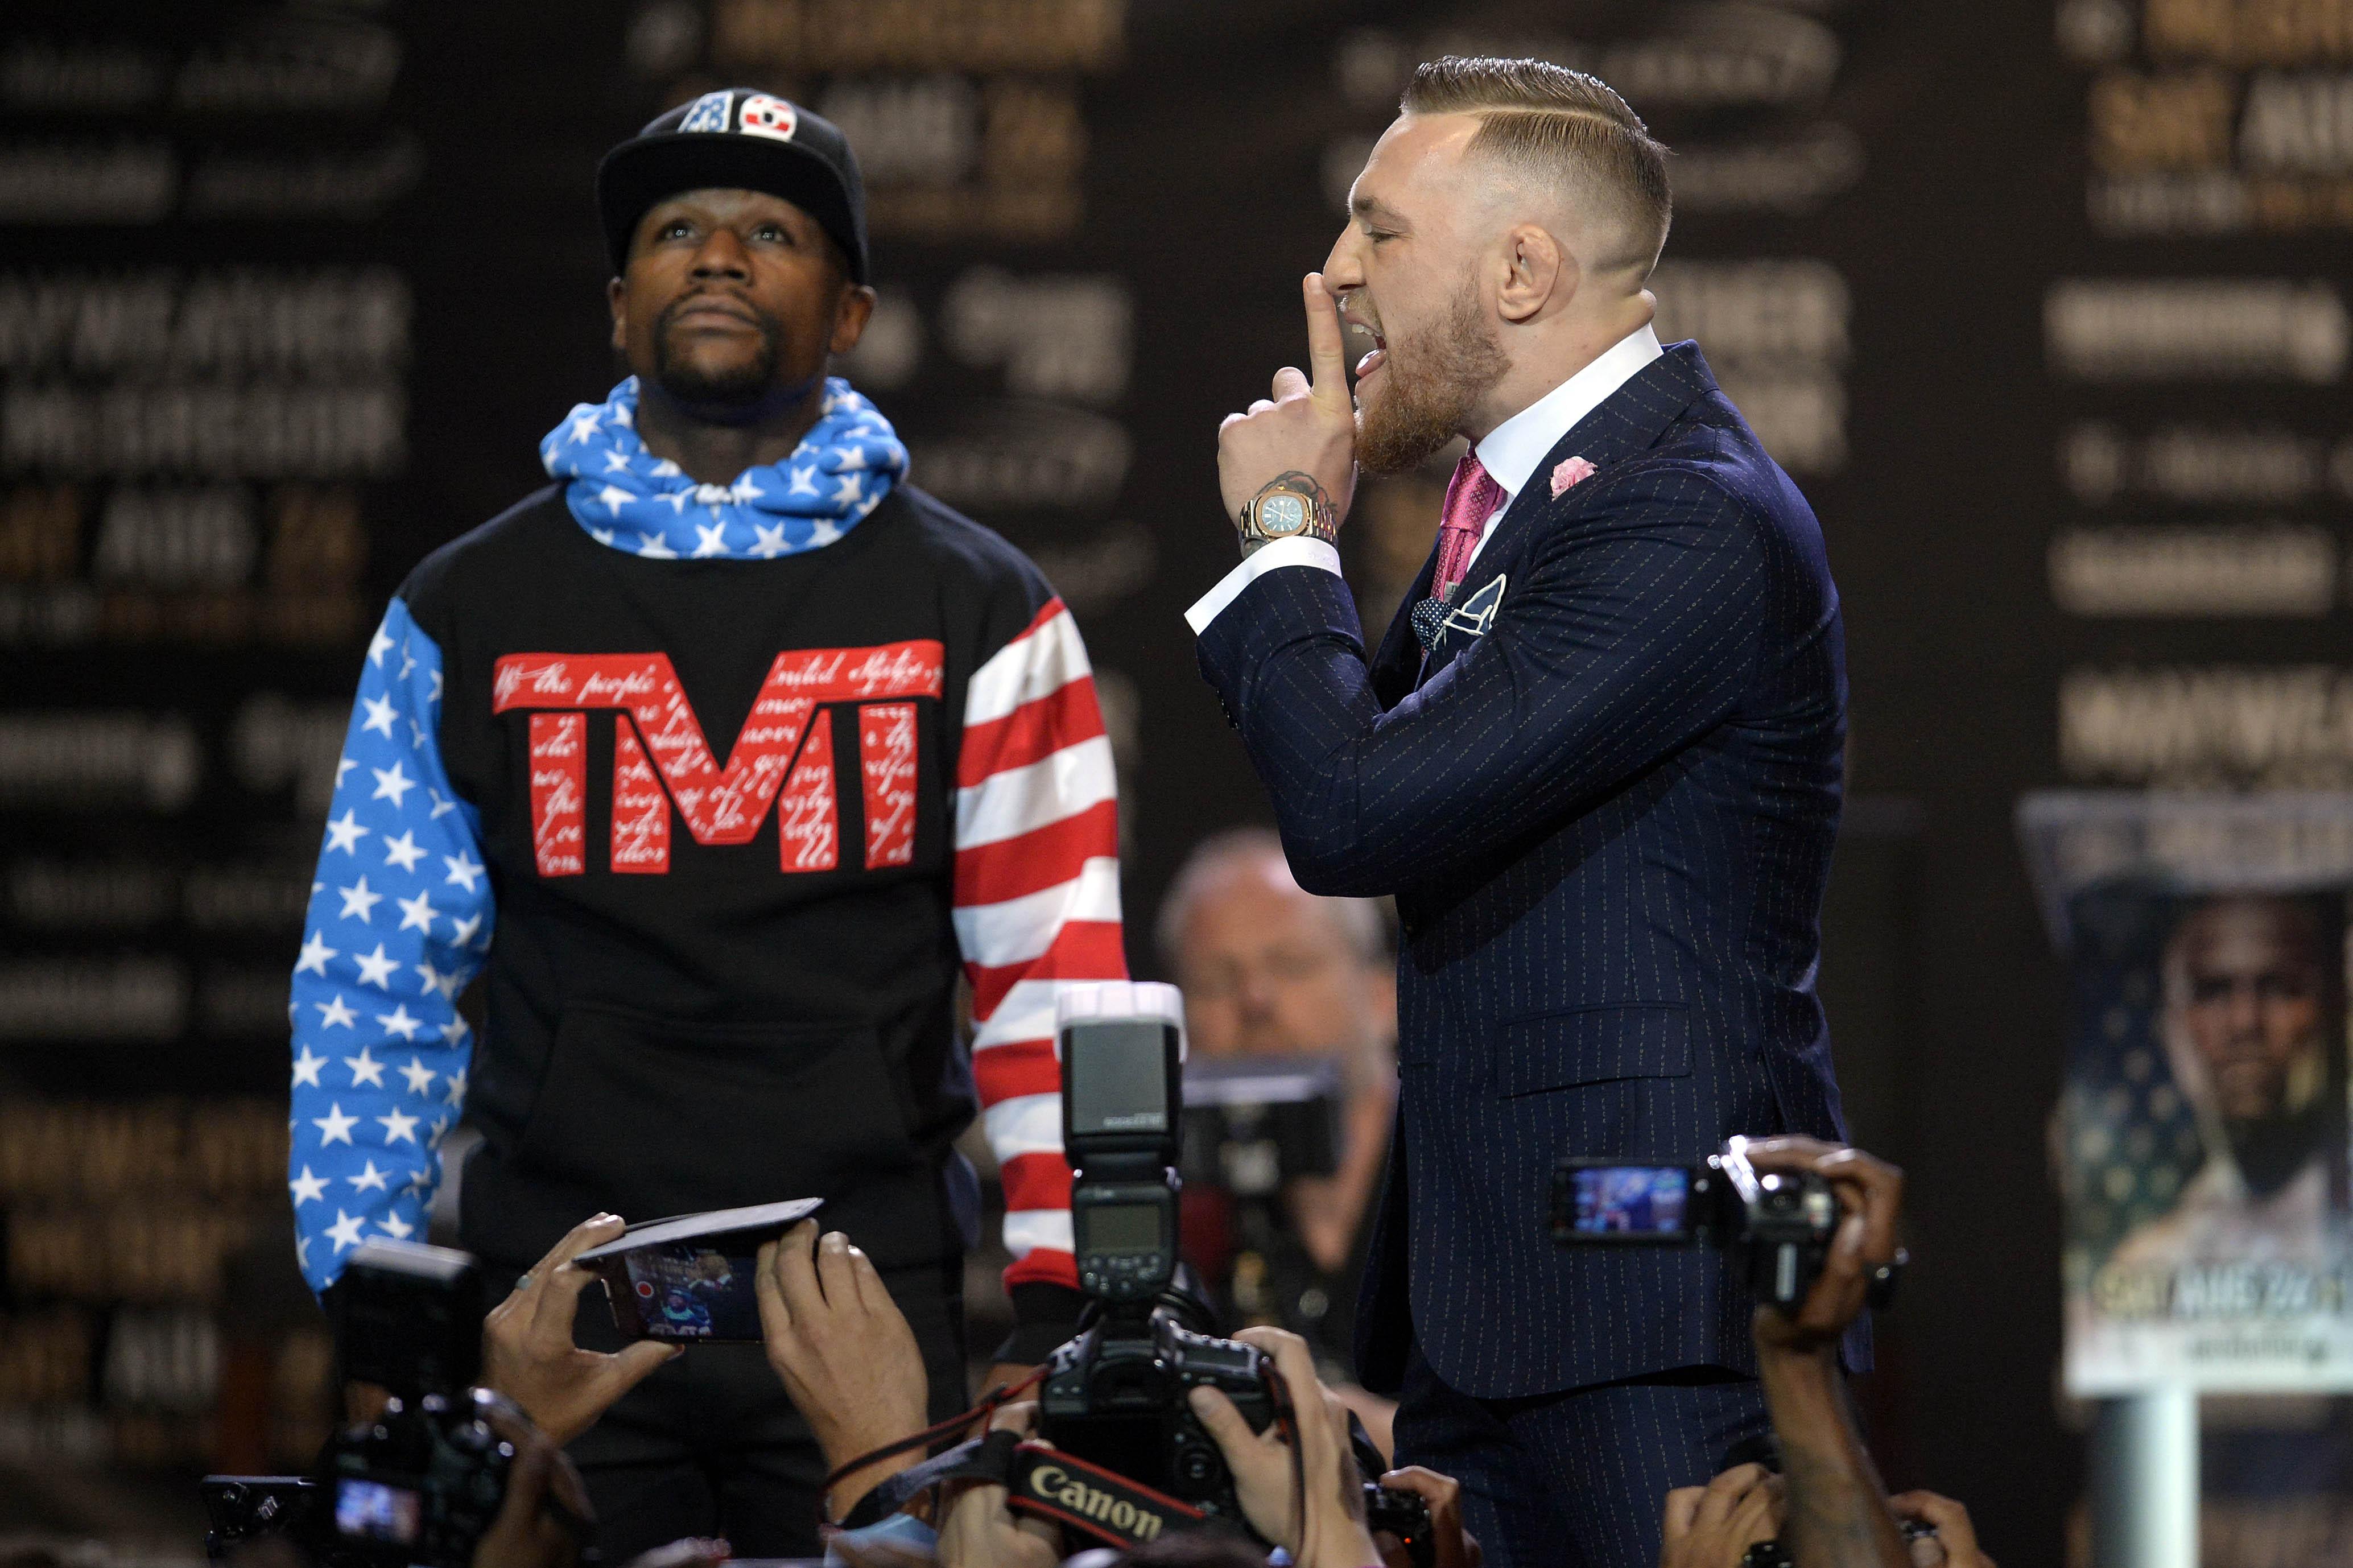 Boxing: Mayweather vs McGregor-World Tour